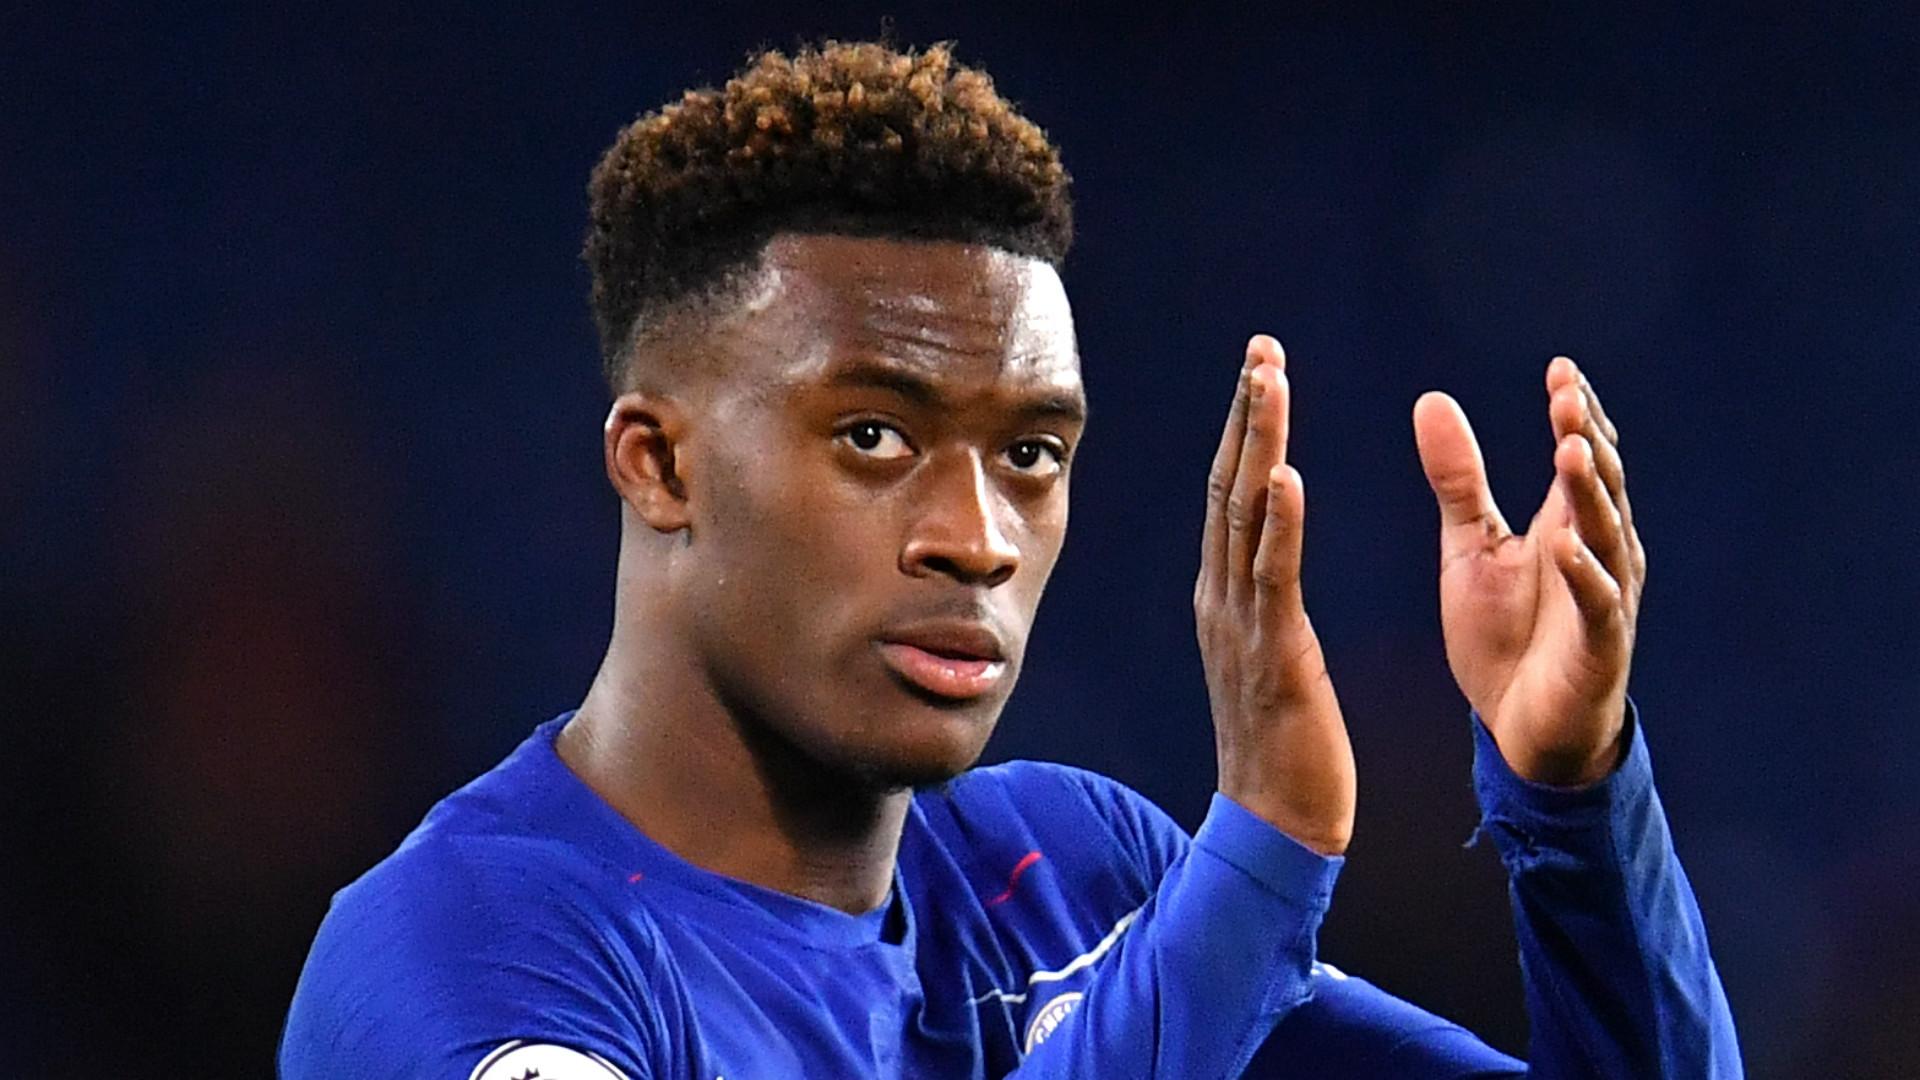 Callum Hudson-Odoi injury: How long will Chelsea star be sidelined for?